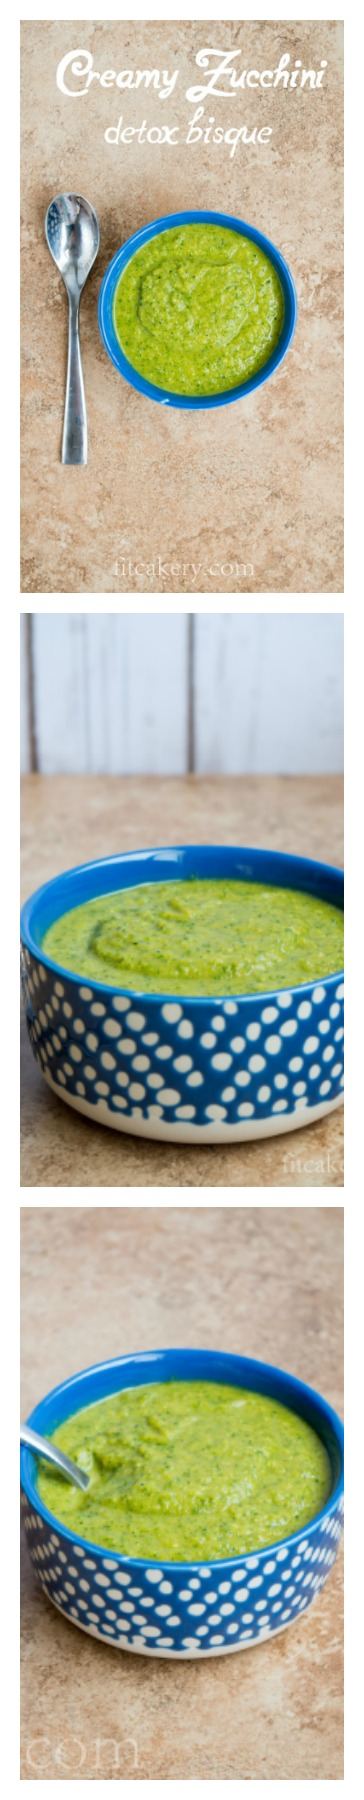 Creamy Zucchini Detox Bisque | gluten-free, vegan-friendly, AIP, paleo | FitCakery.com